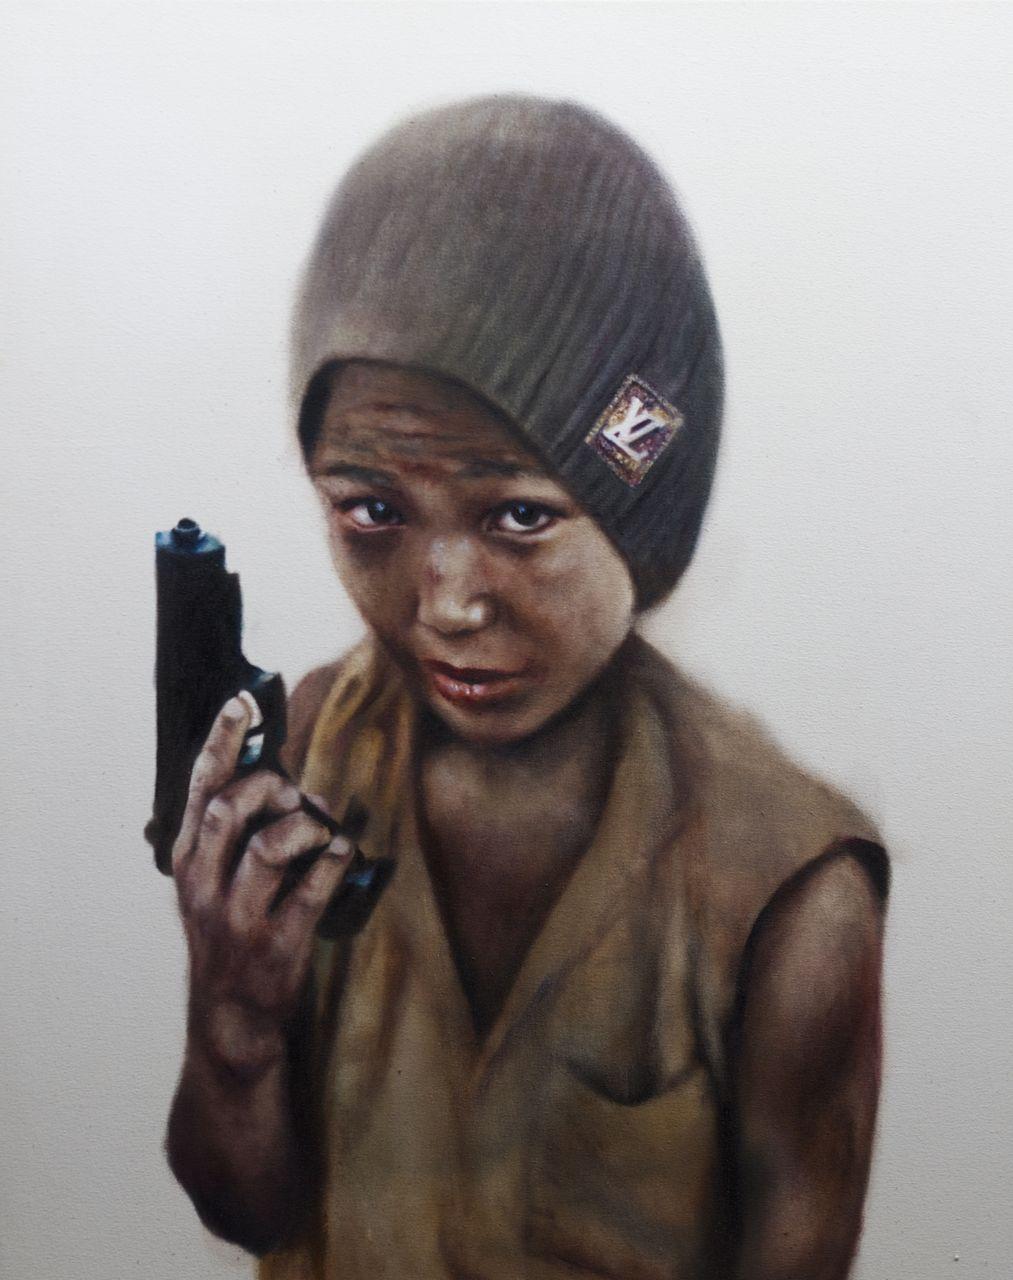 'Soldier'. New York. 2014.